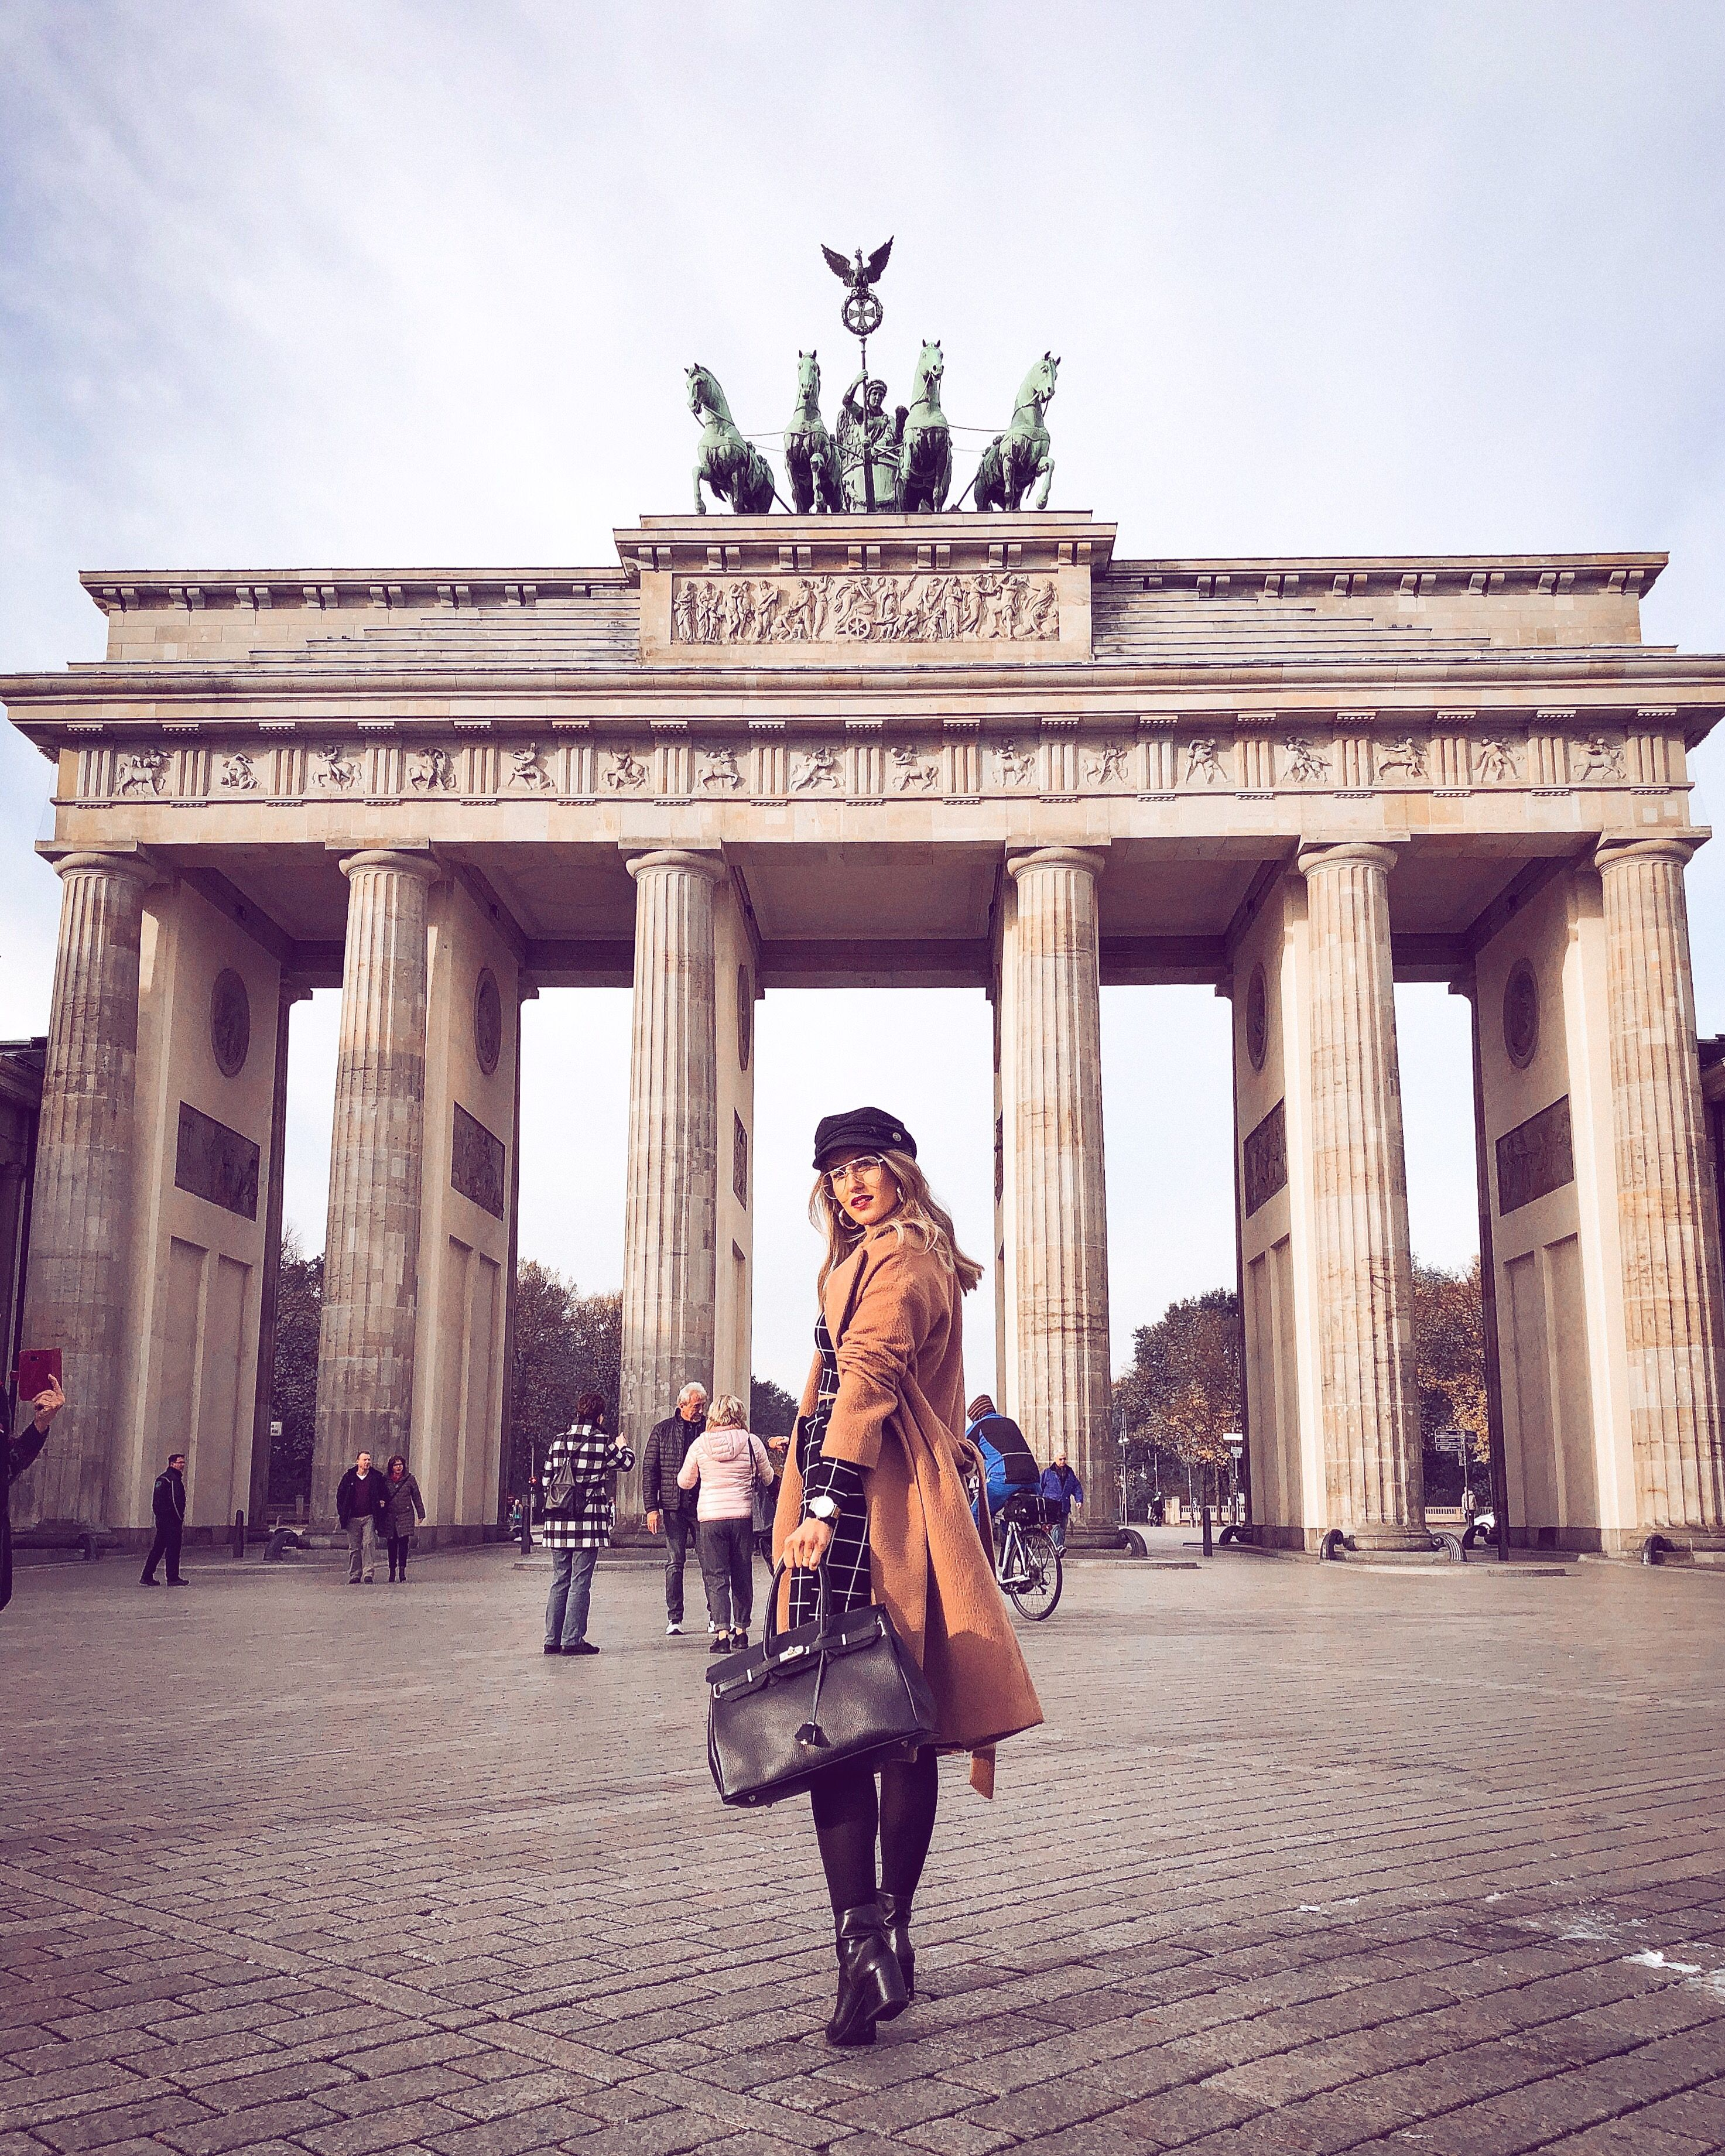 Berlin Berlin Travel Photography Berlin Travel Berlin Photography